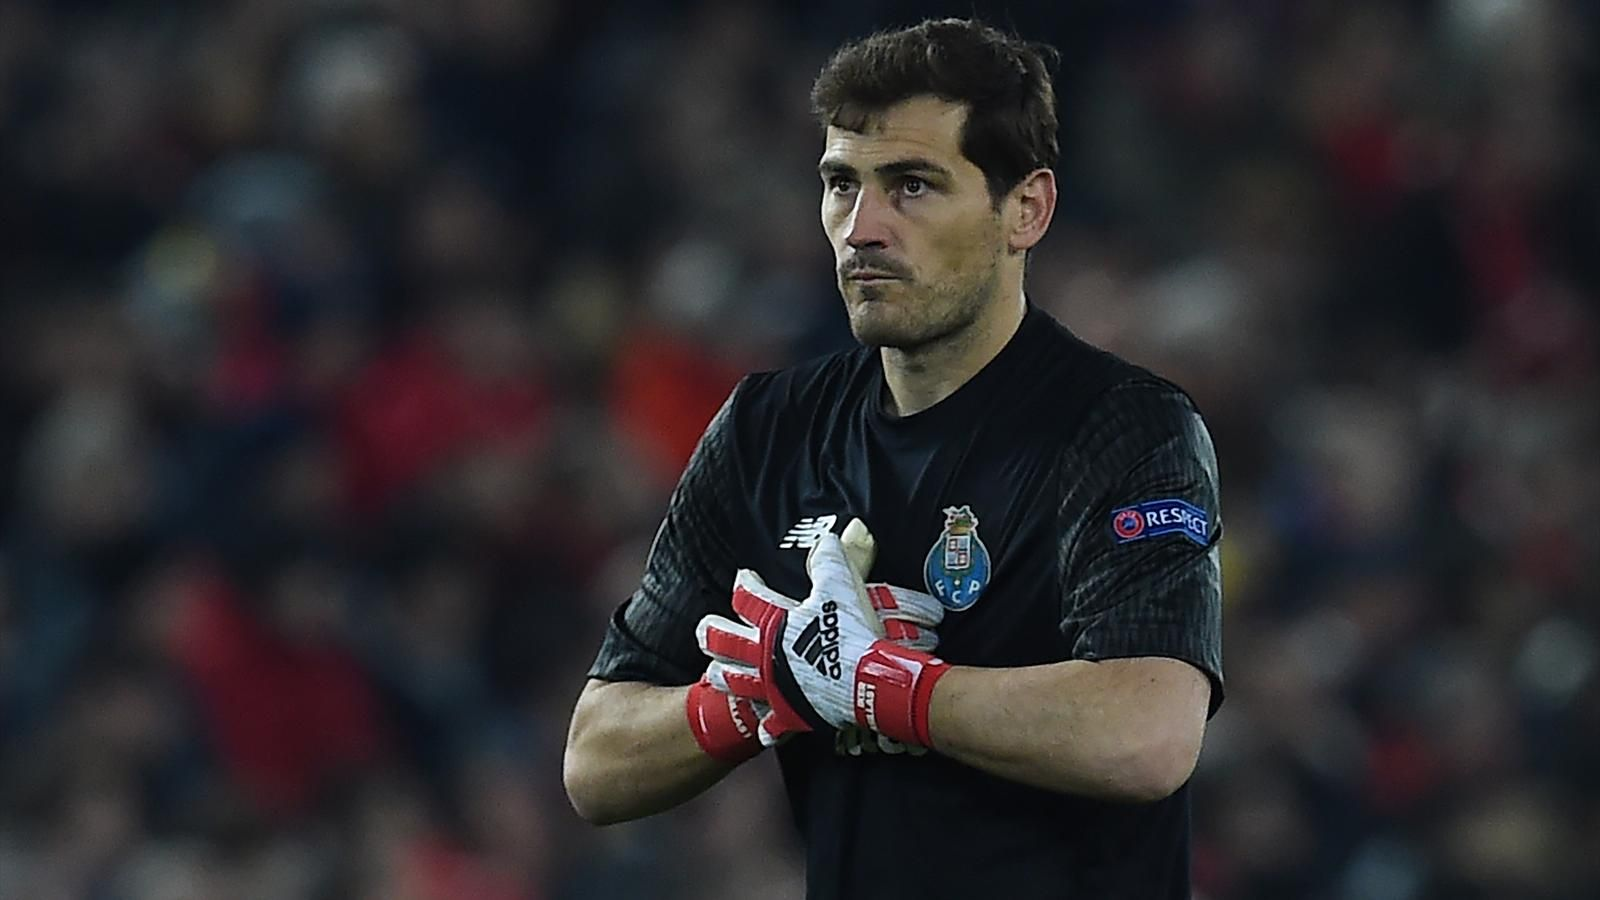 VÍDEO: Iker Casillas llega a 20 Champions y rompe récord histórico